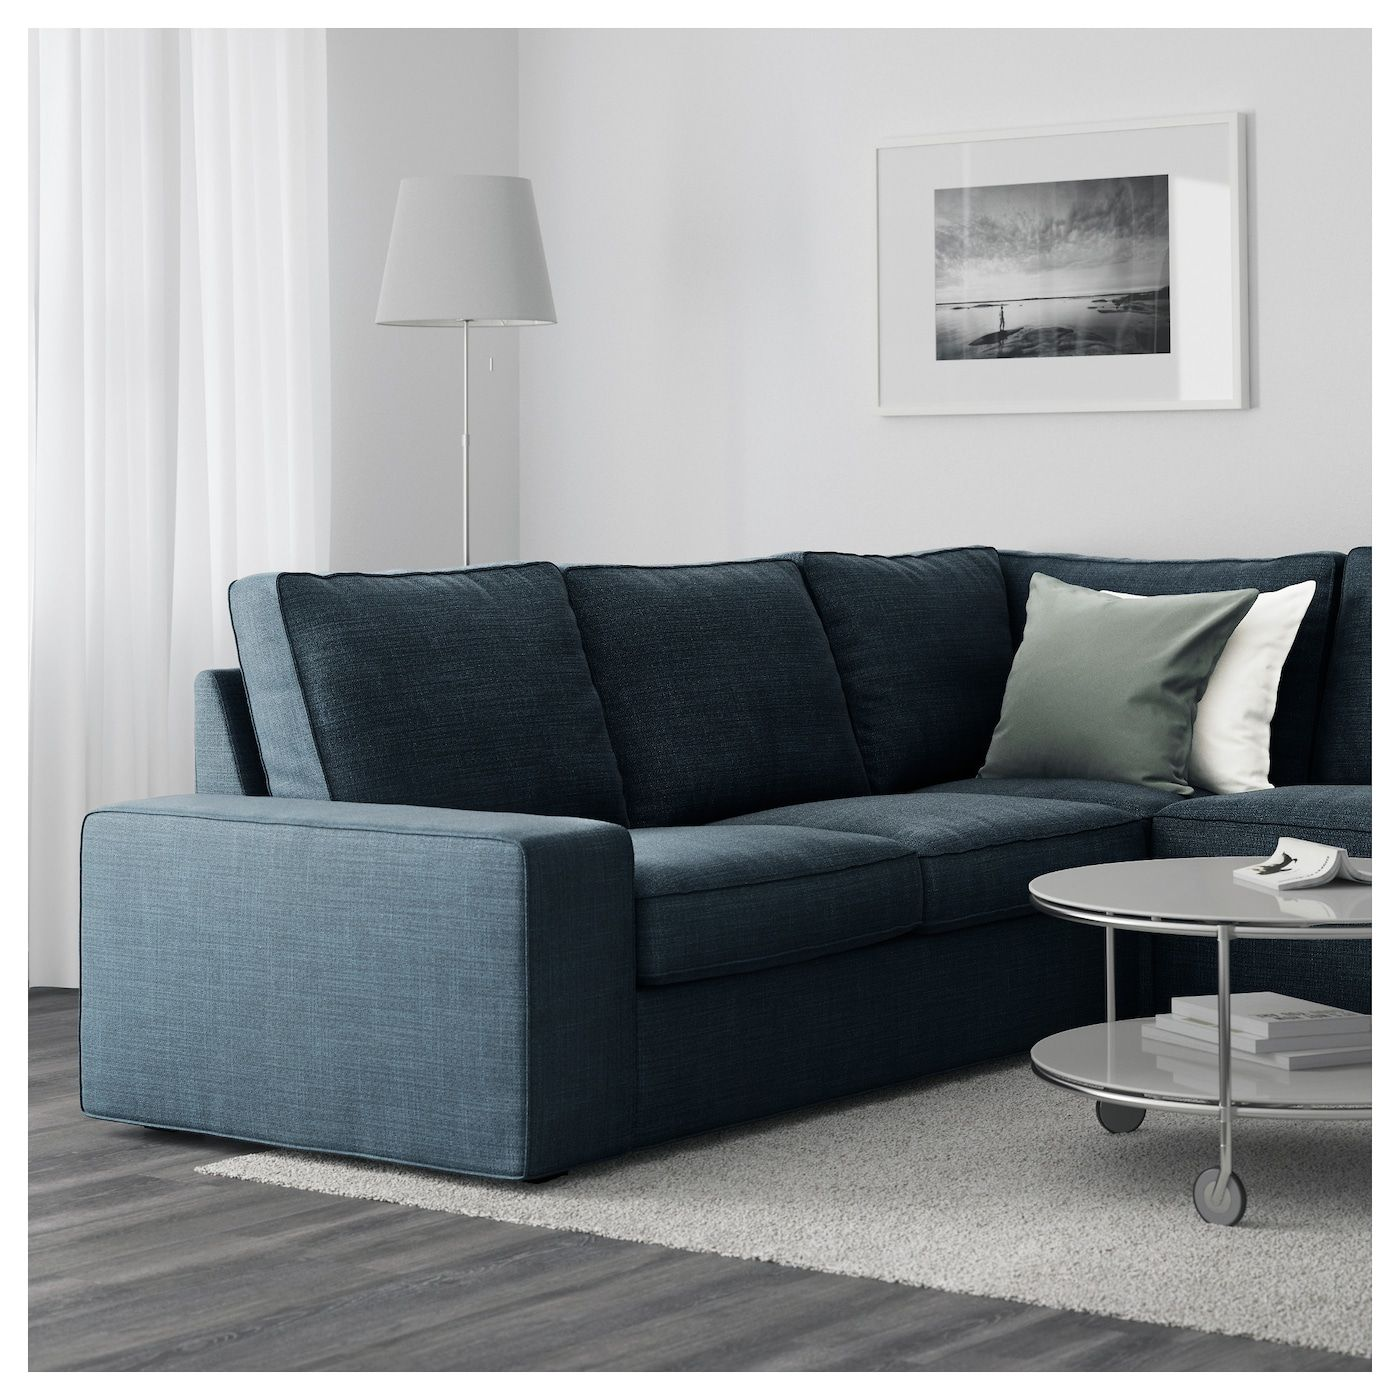 Kivik Sectional 5 Seat Corner Hillared With Chaise Hillared Dark Blue Ikea Ikea Sofa Ikea Sectional Ikea Sofa Bed